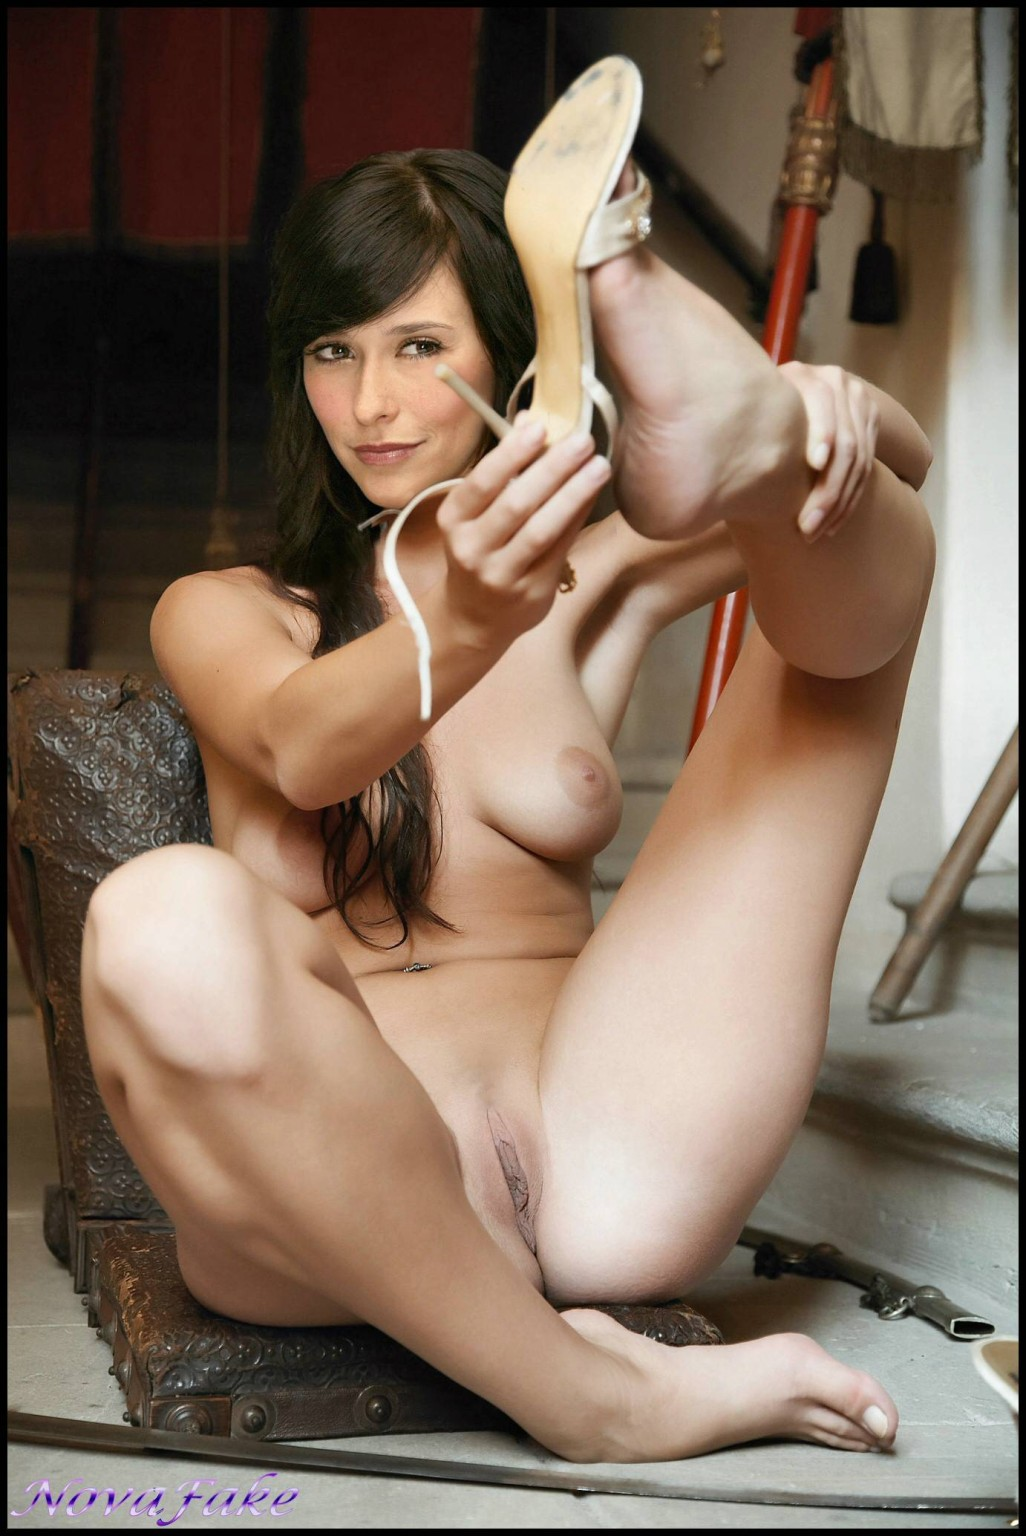 Jennifer Love Hewitt Naked Porn Jennifer Love Hewitt In Sexy Lingerie And Naked Pics